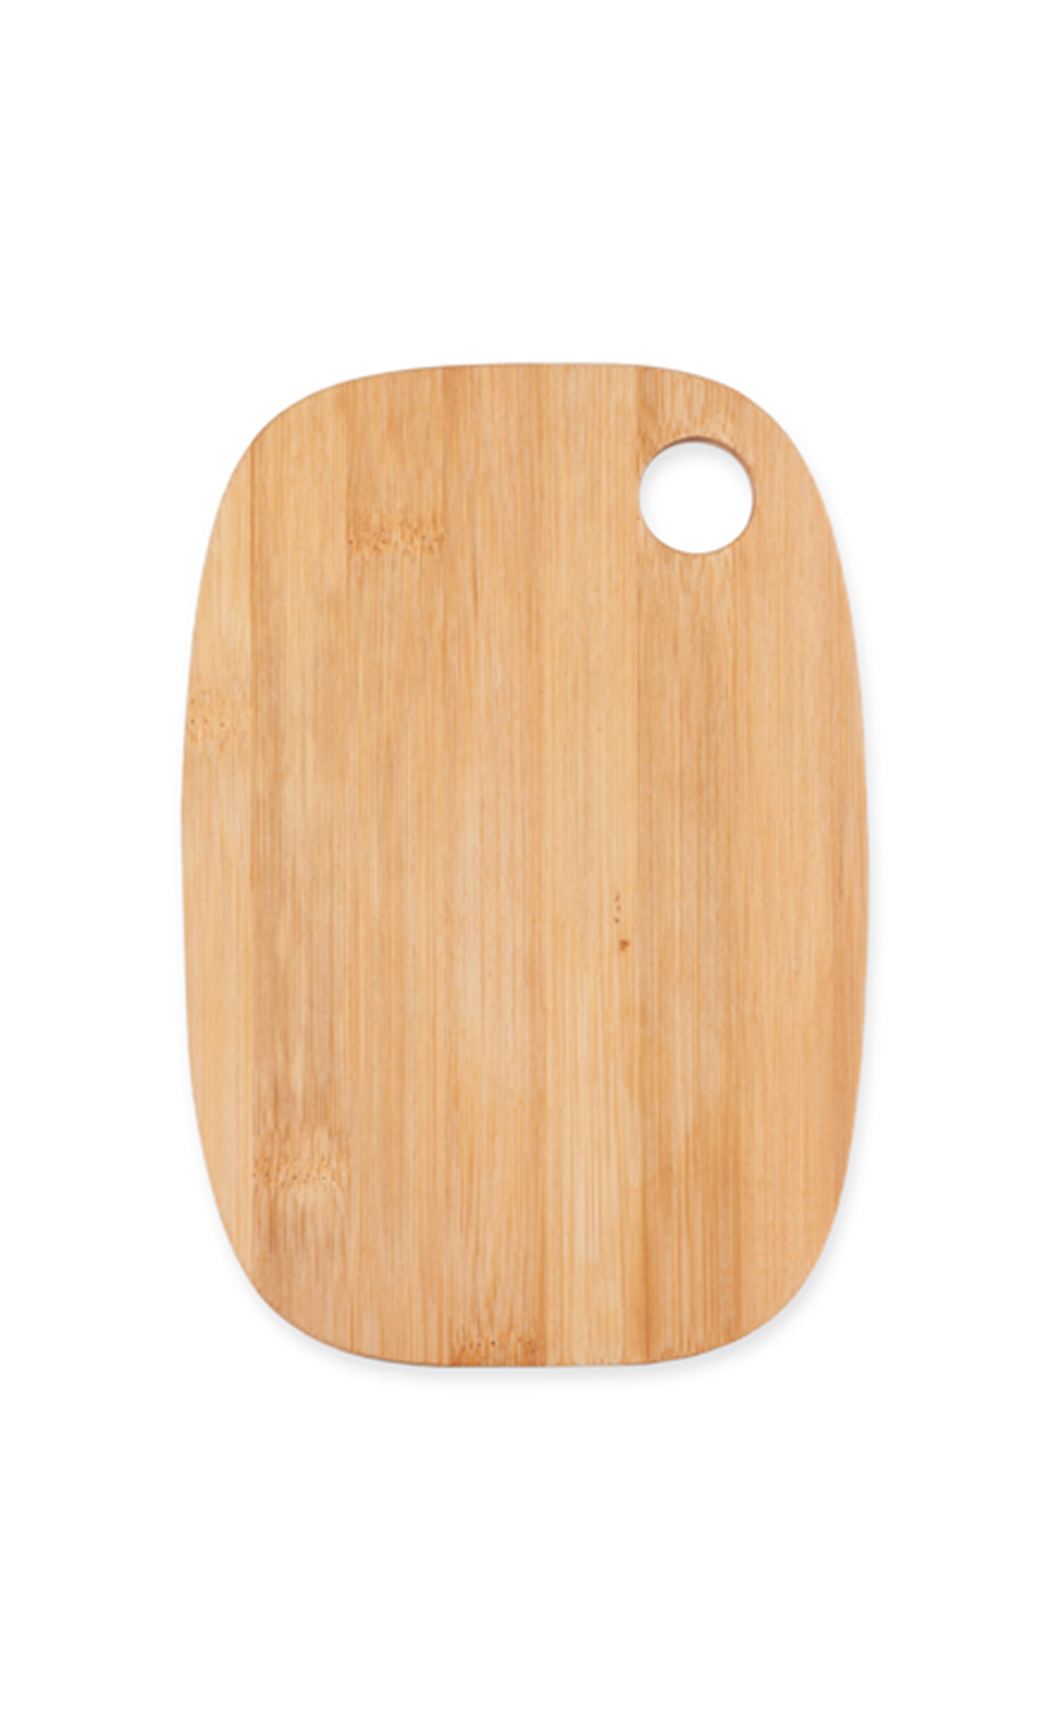 Morsel Bamboo Serving Board